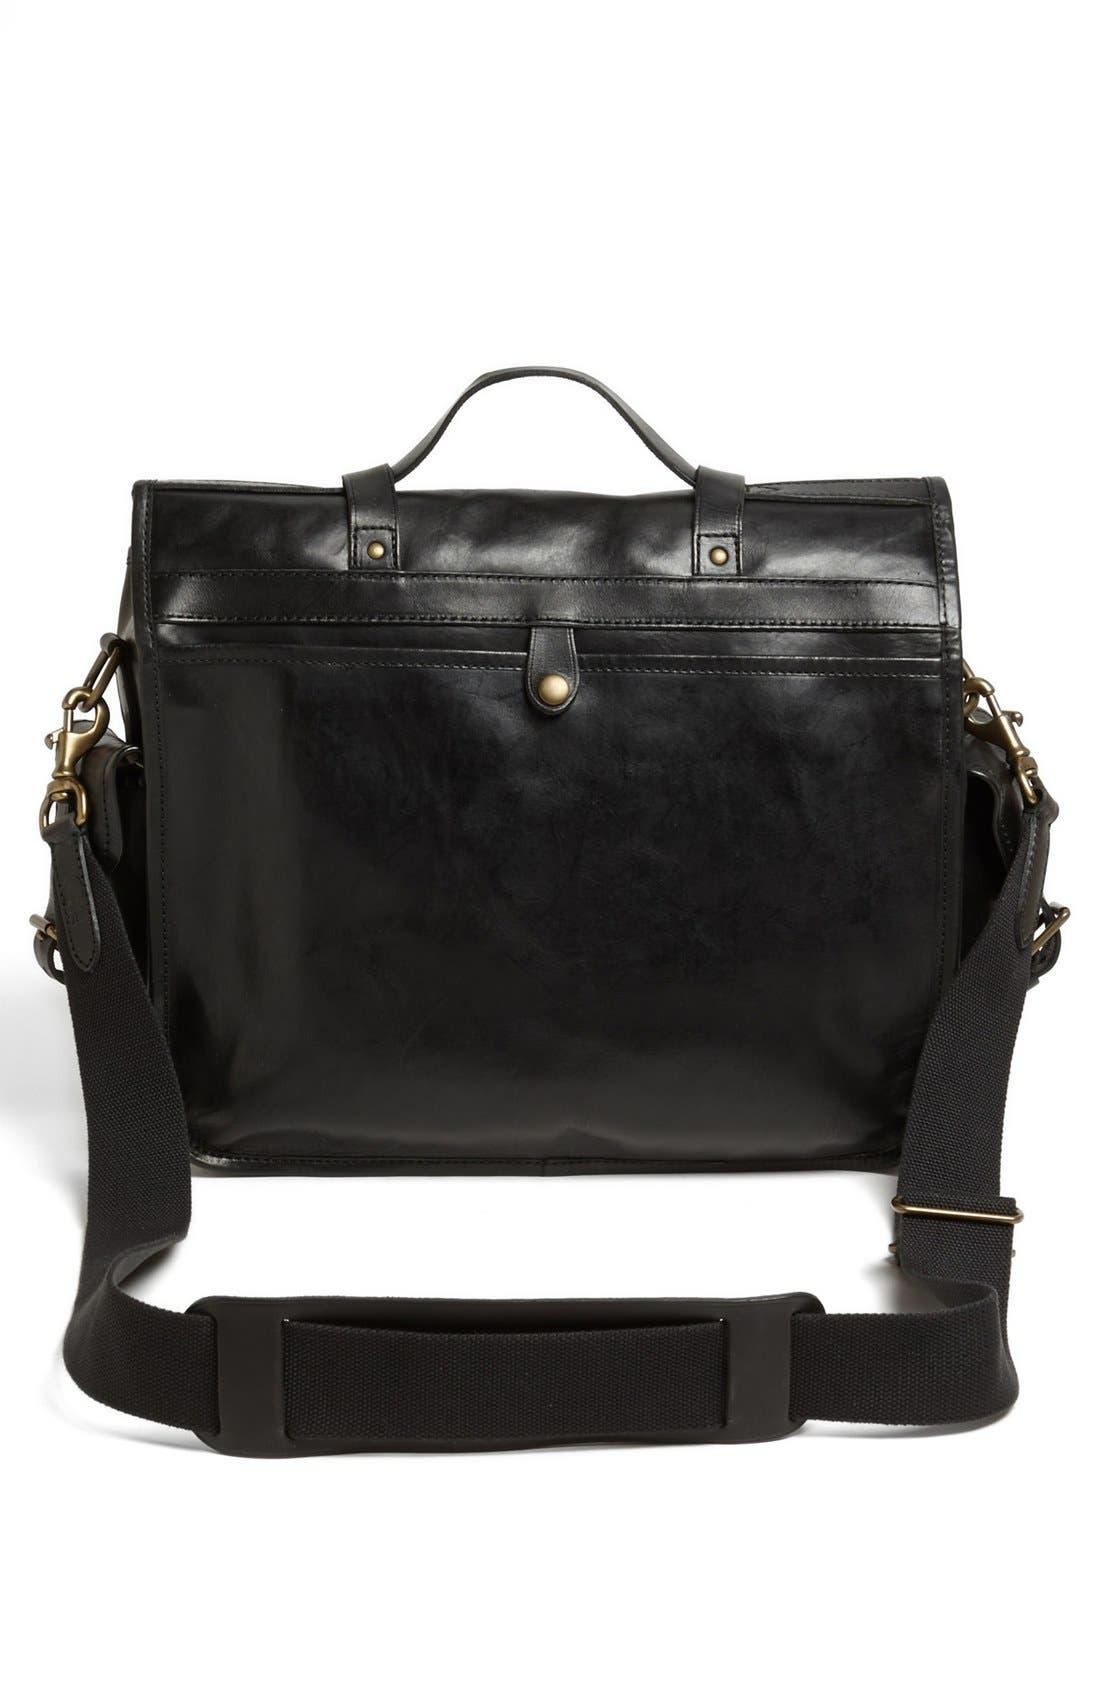 POLO RALPH LAUREN, Leather Briefcase, Alternate thumbnail 4, color, 001